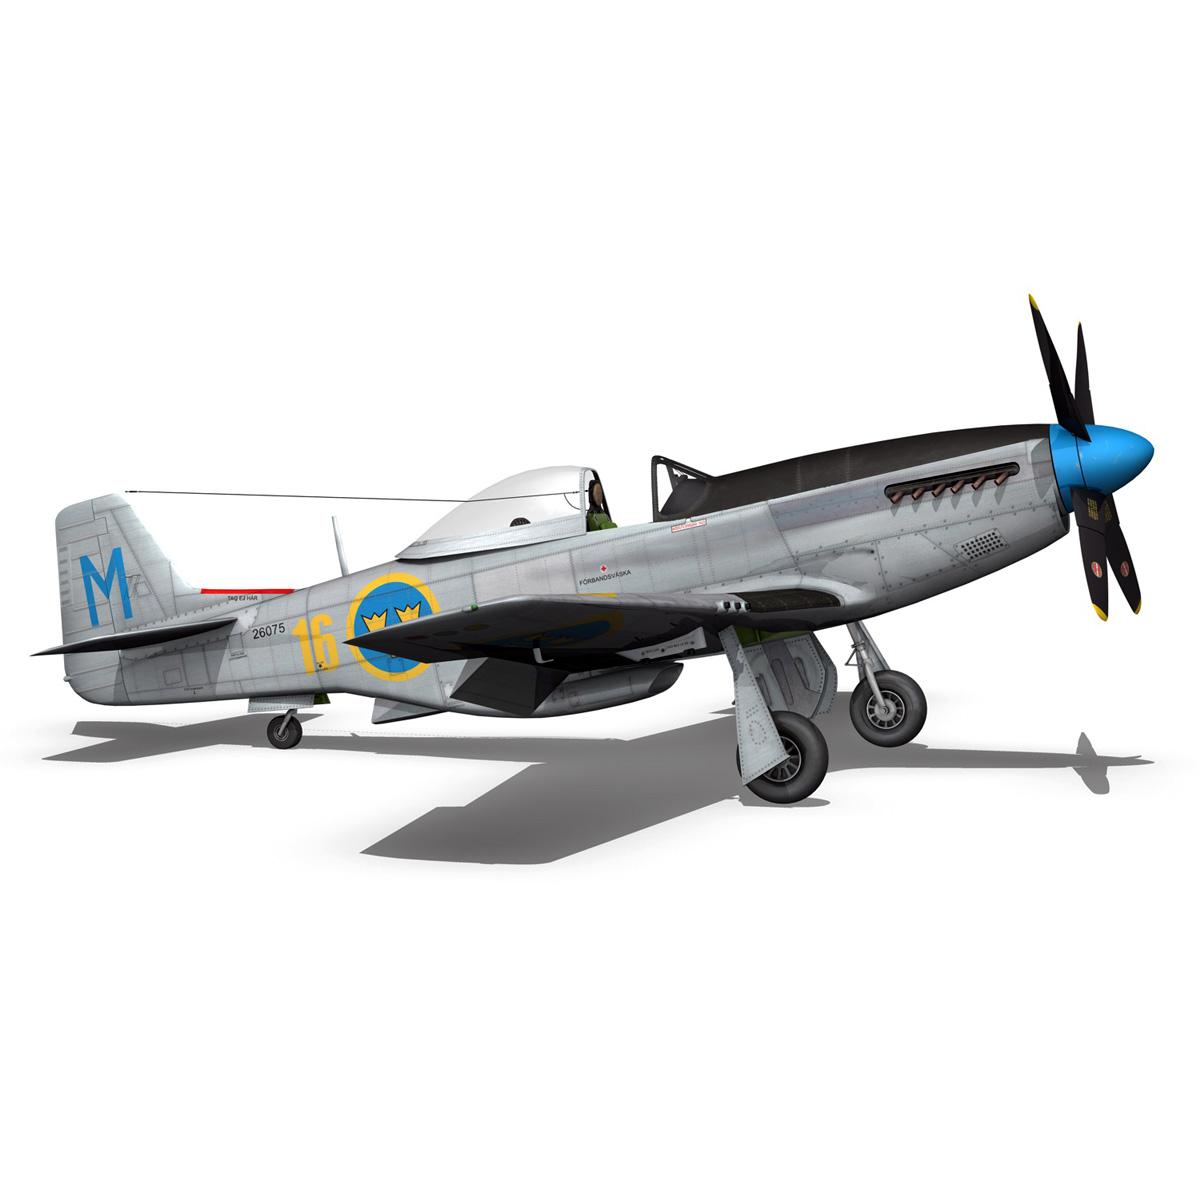 north american p-51d mustang – swedisch airforce 3d model fbx c4d lwo obj 268240